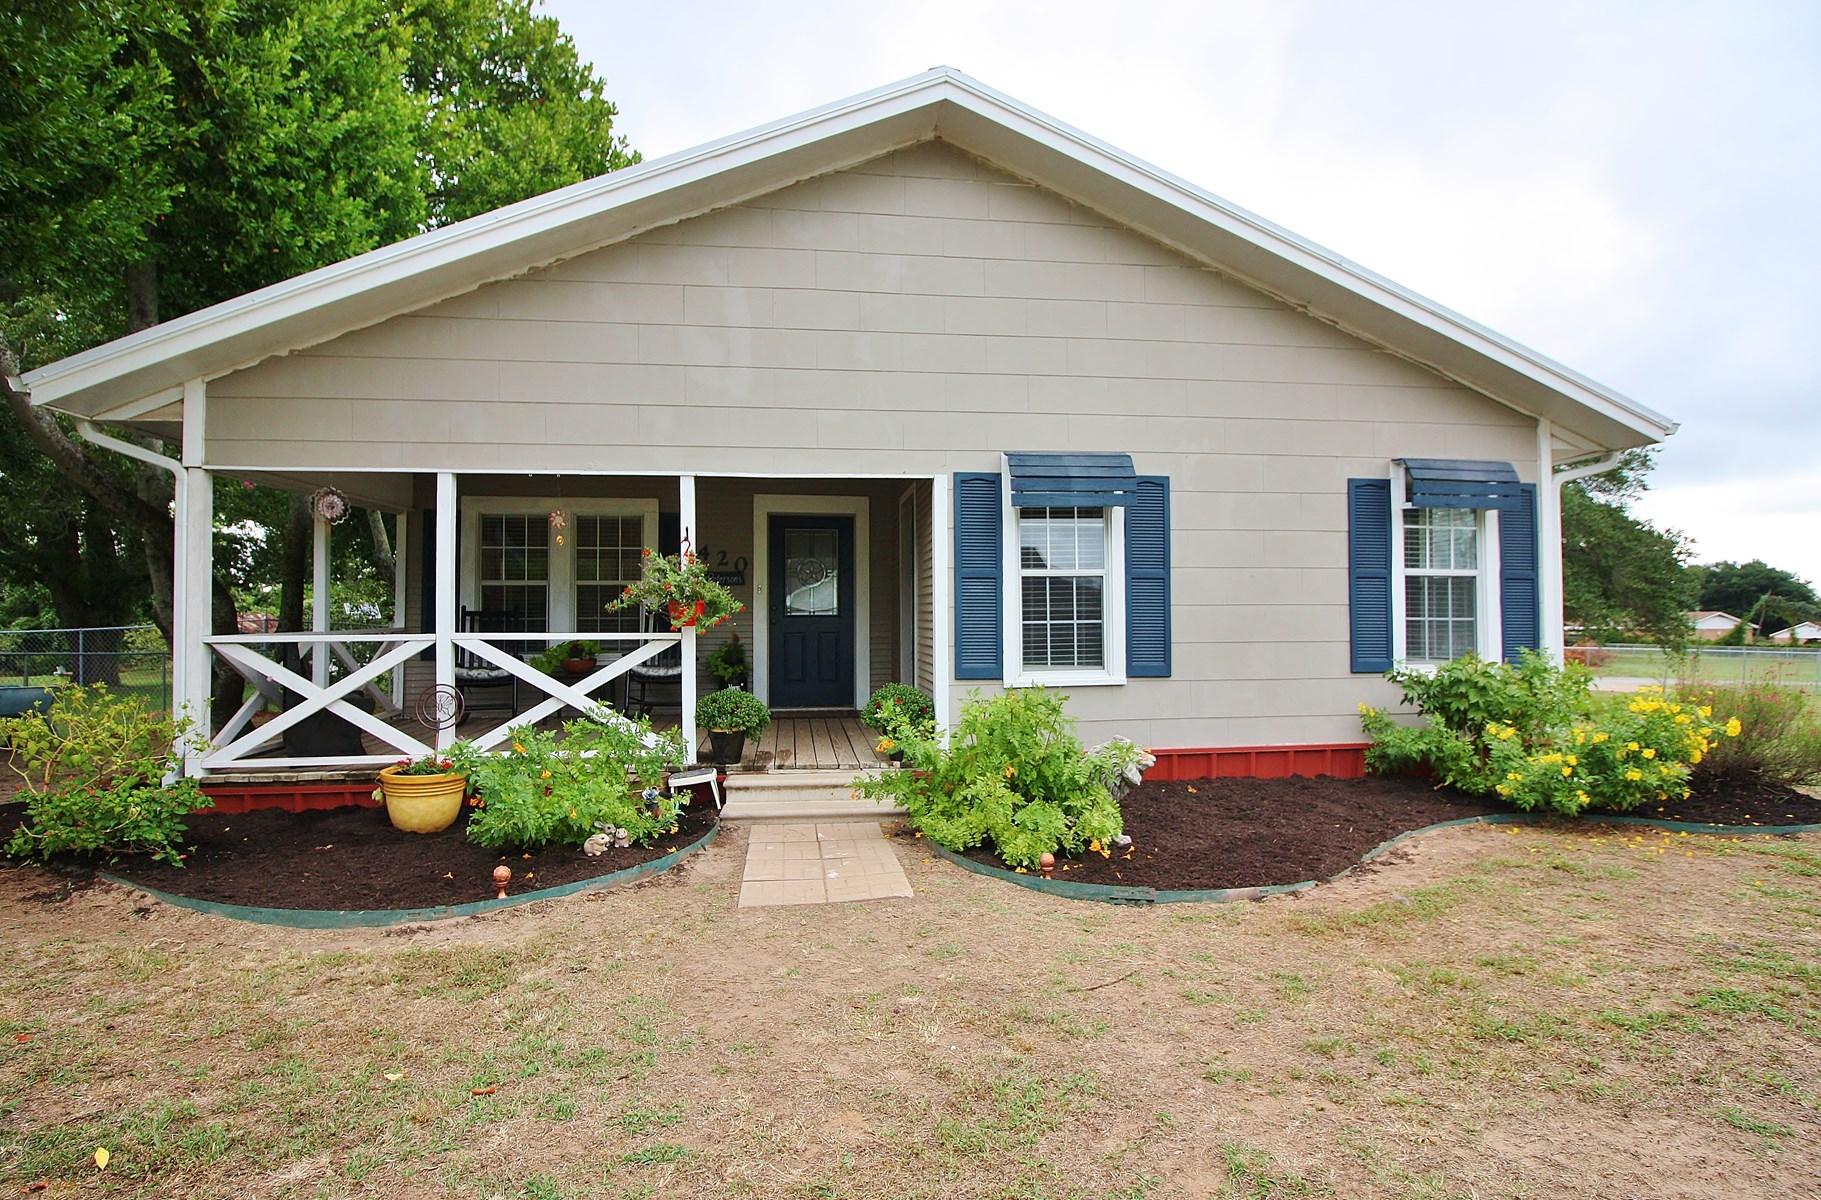 1937 Home on Acreage in Jewett, TX